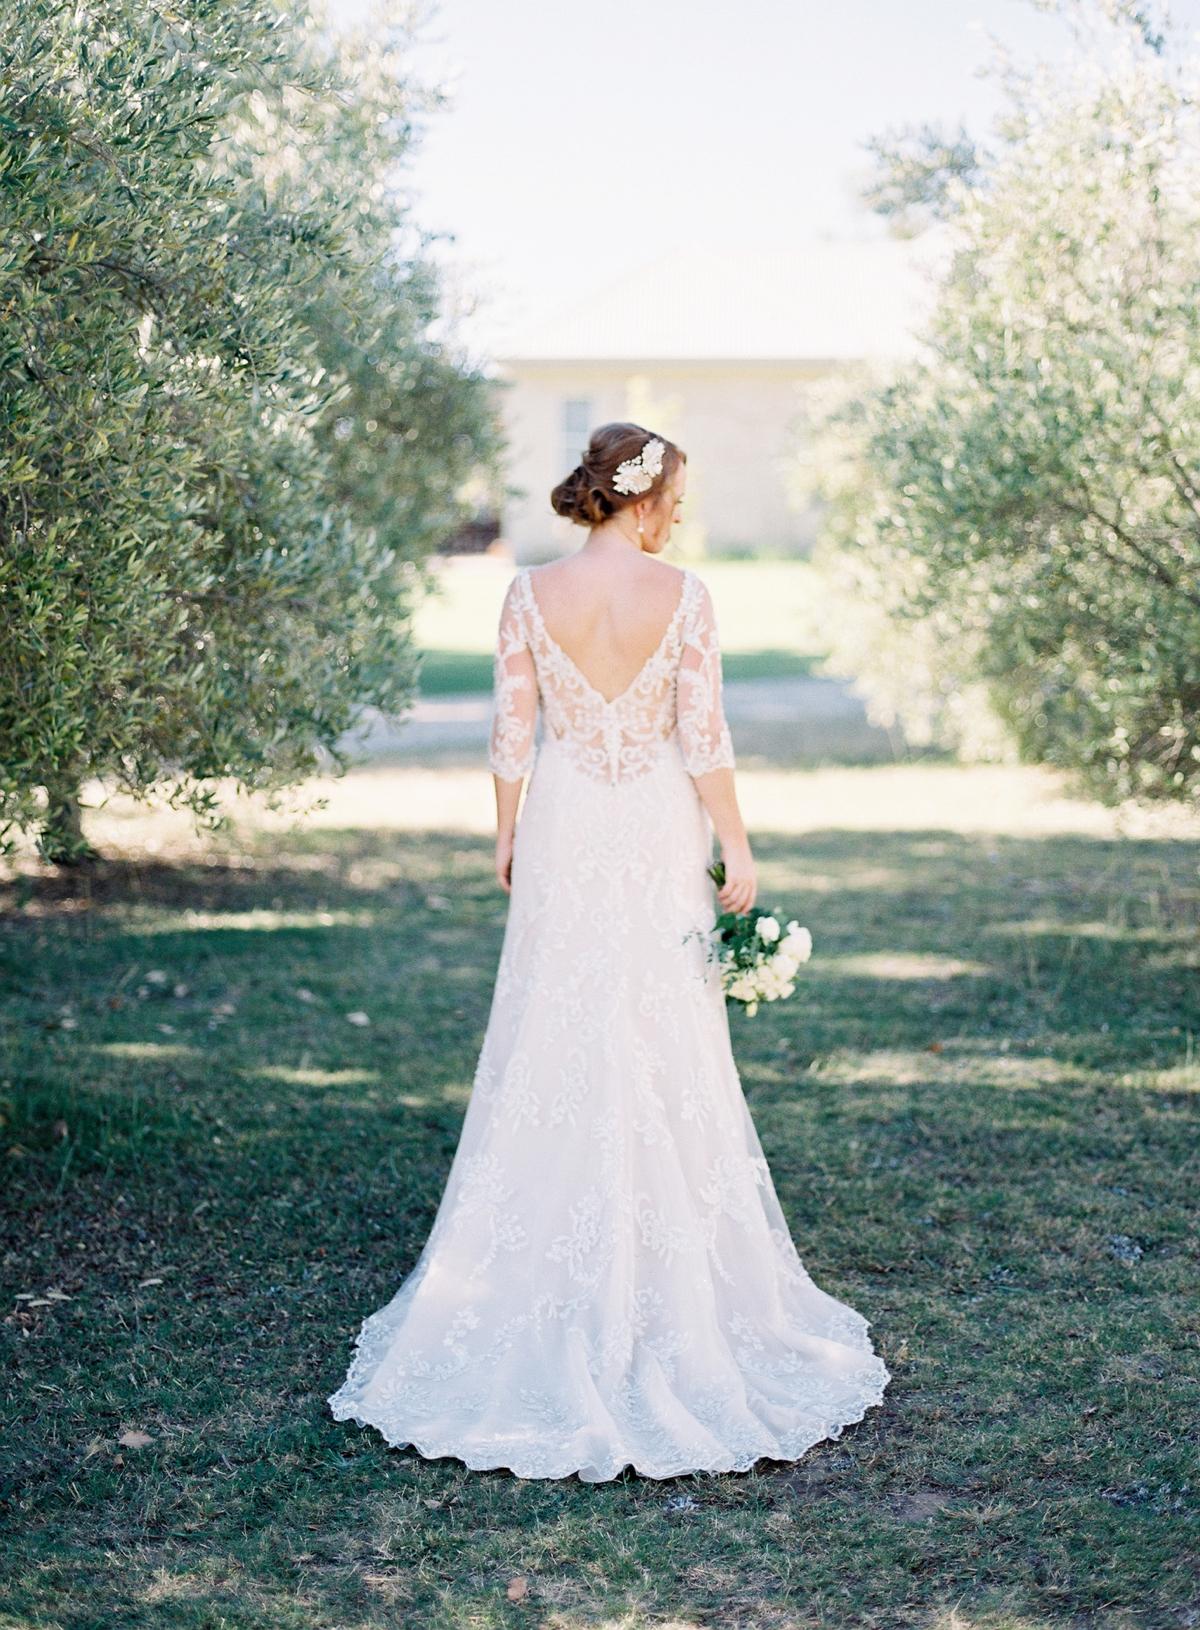 The Vine Grove Mudgee Wedding, Photography by Mr Edwards_1784.jpg